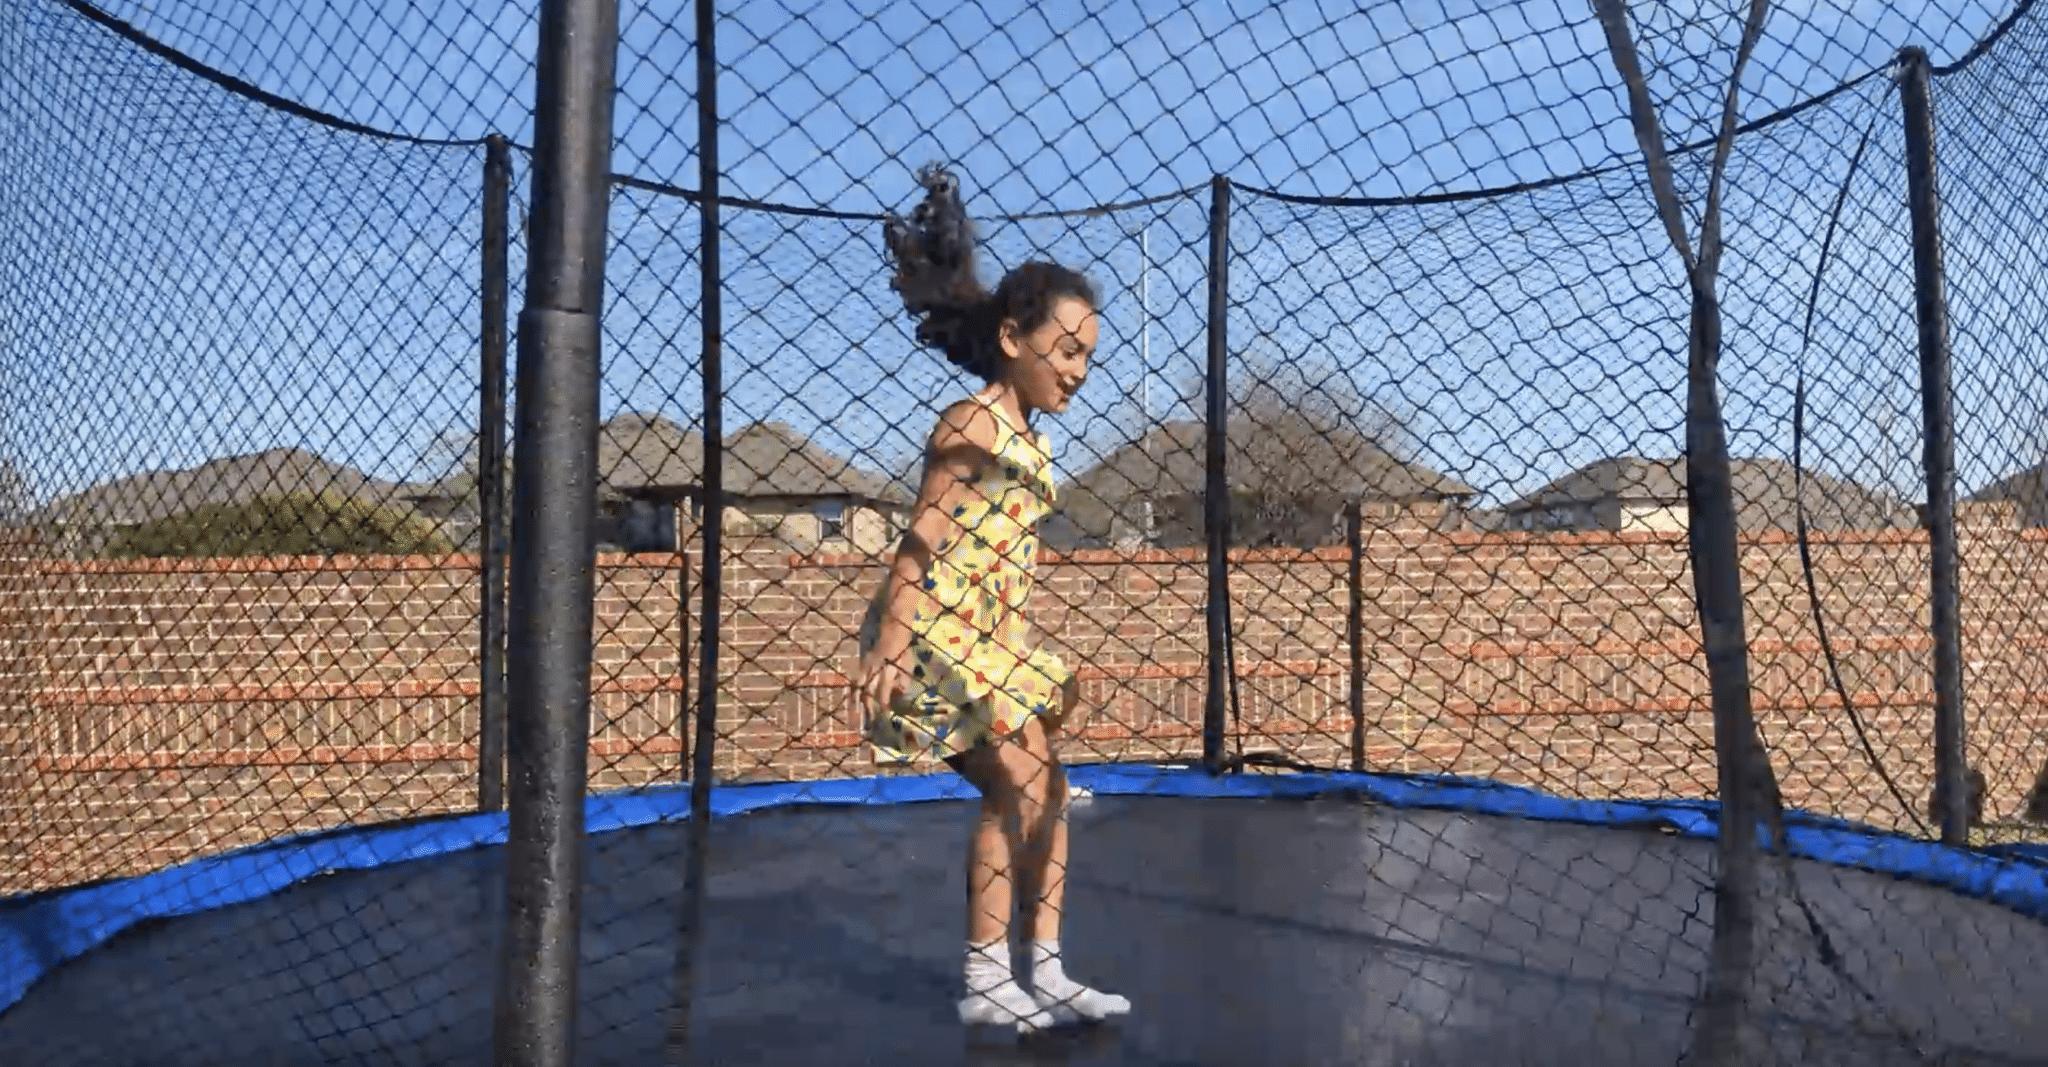 jumping on jumpsport trampoline